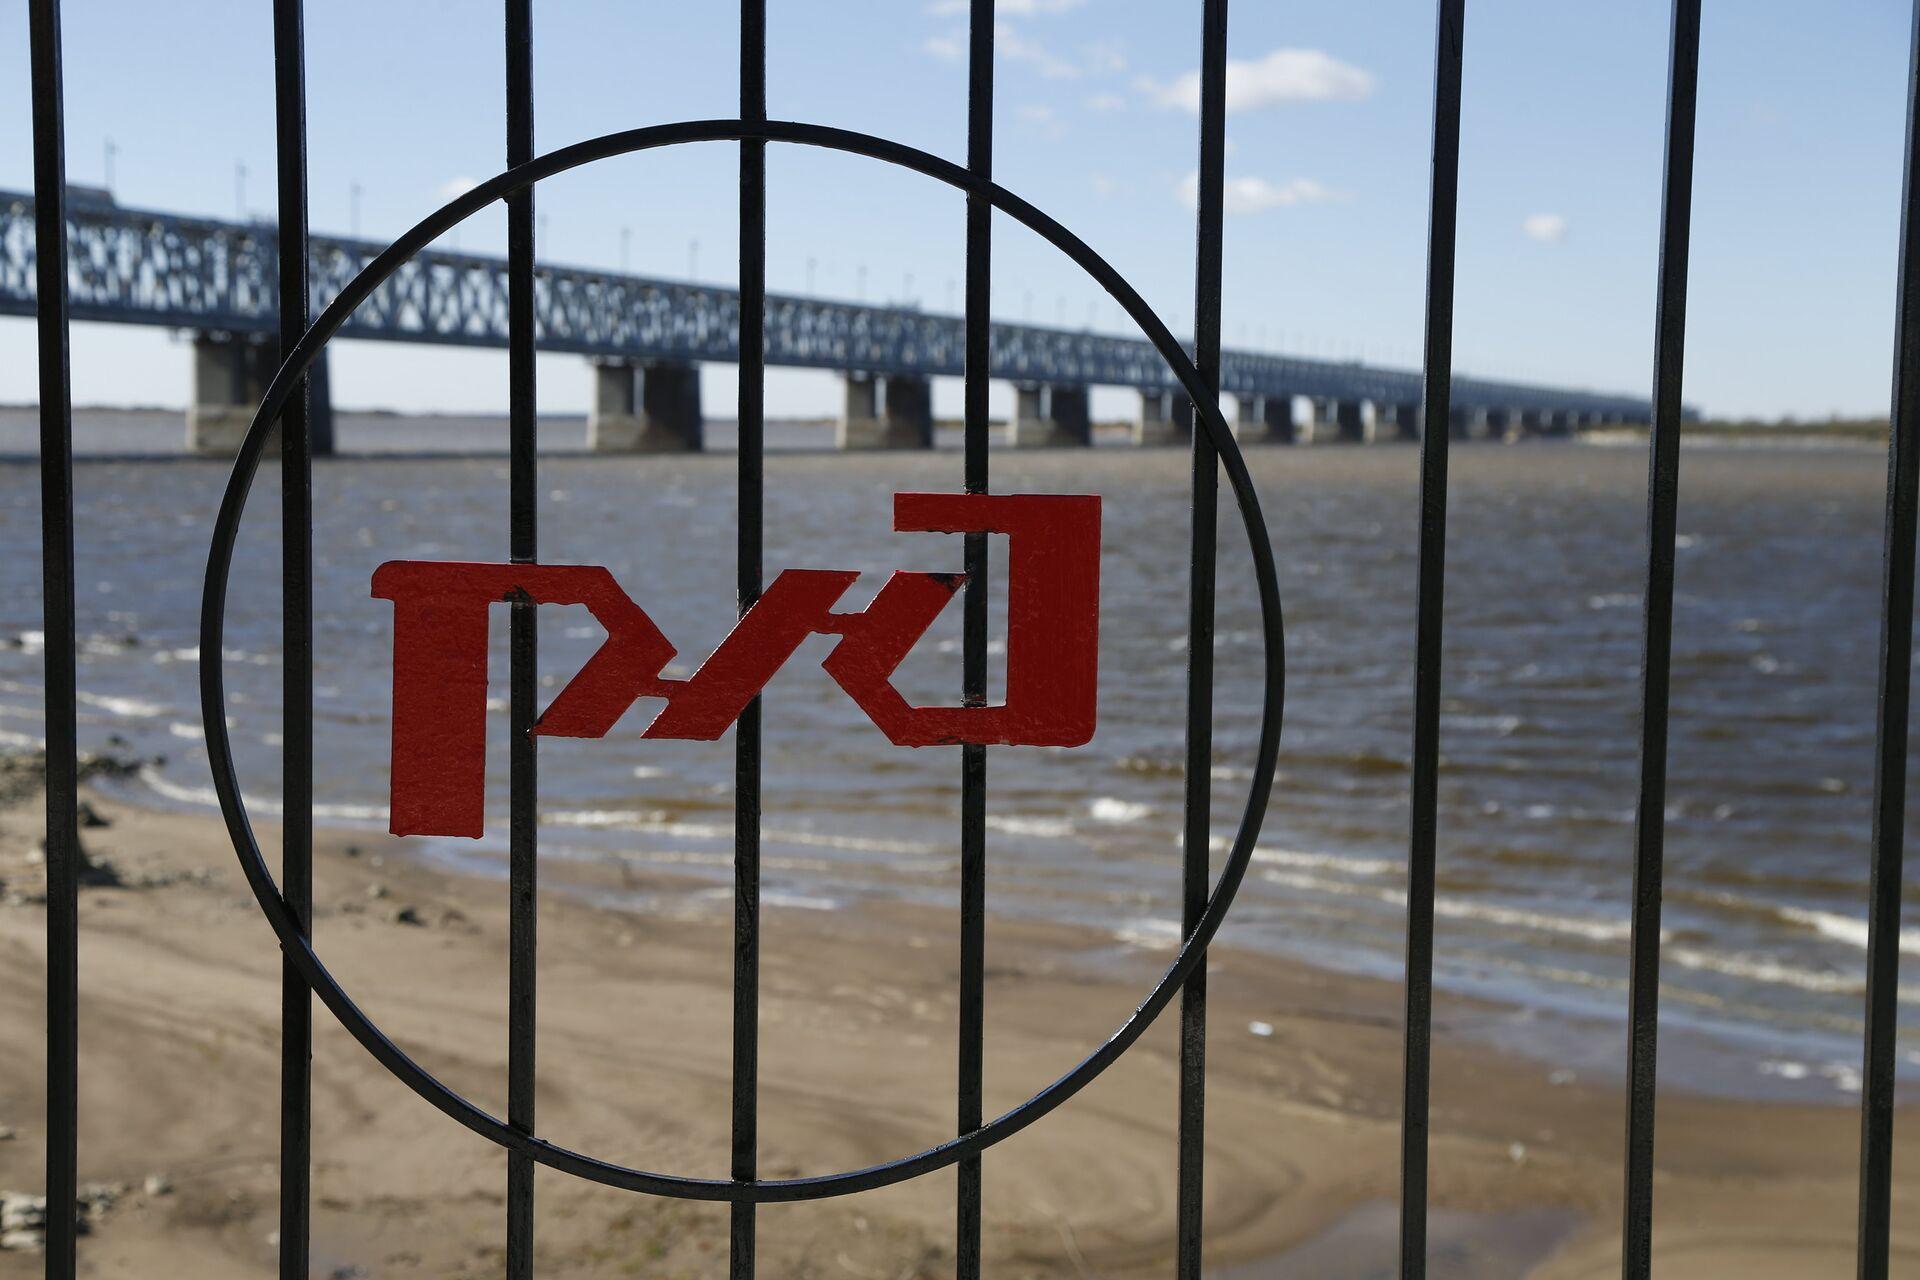 Логотип РЖД на фоне железнодорожного моста - РИА Новости, 1920, 29.07.2021